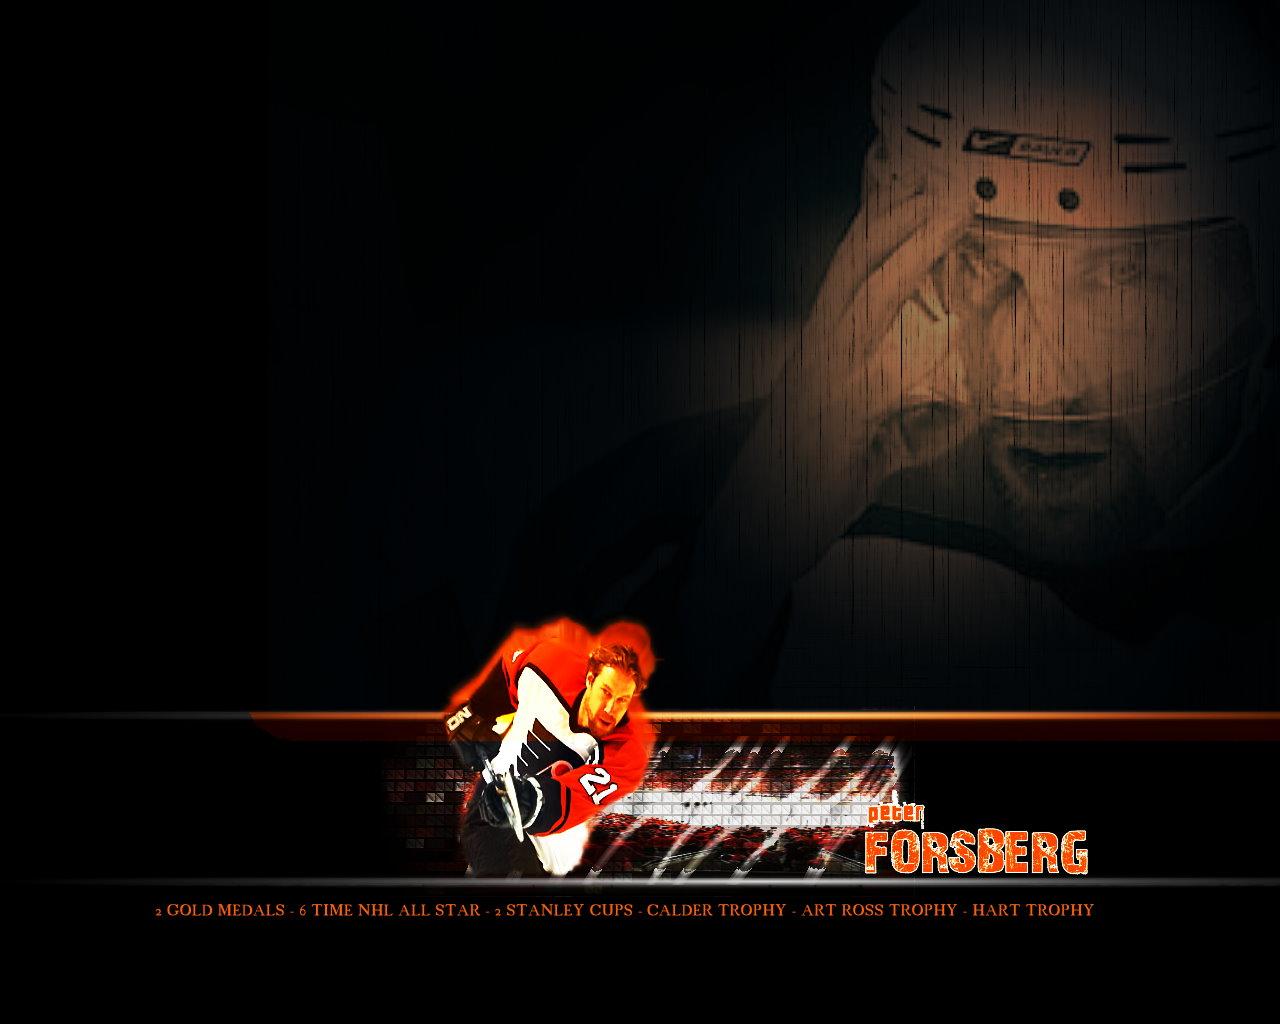 Peter Forsberg Wallpaper